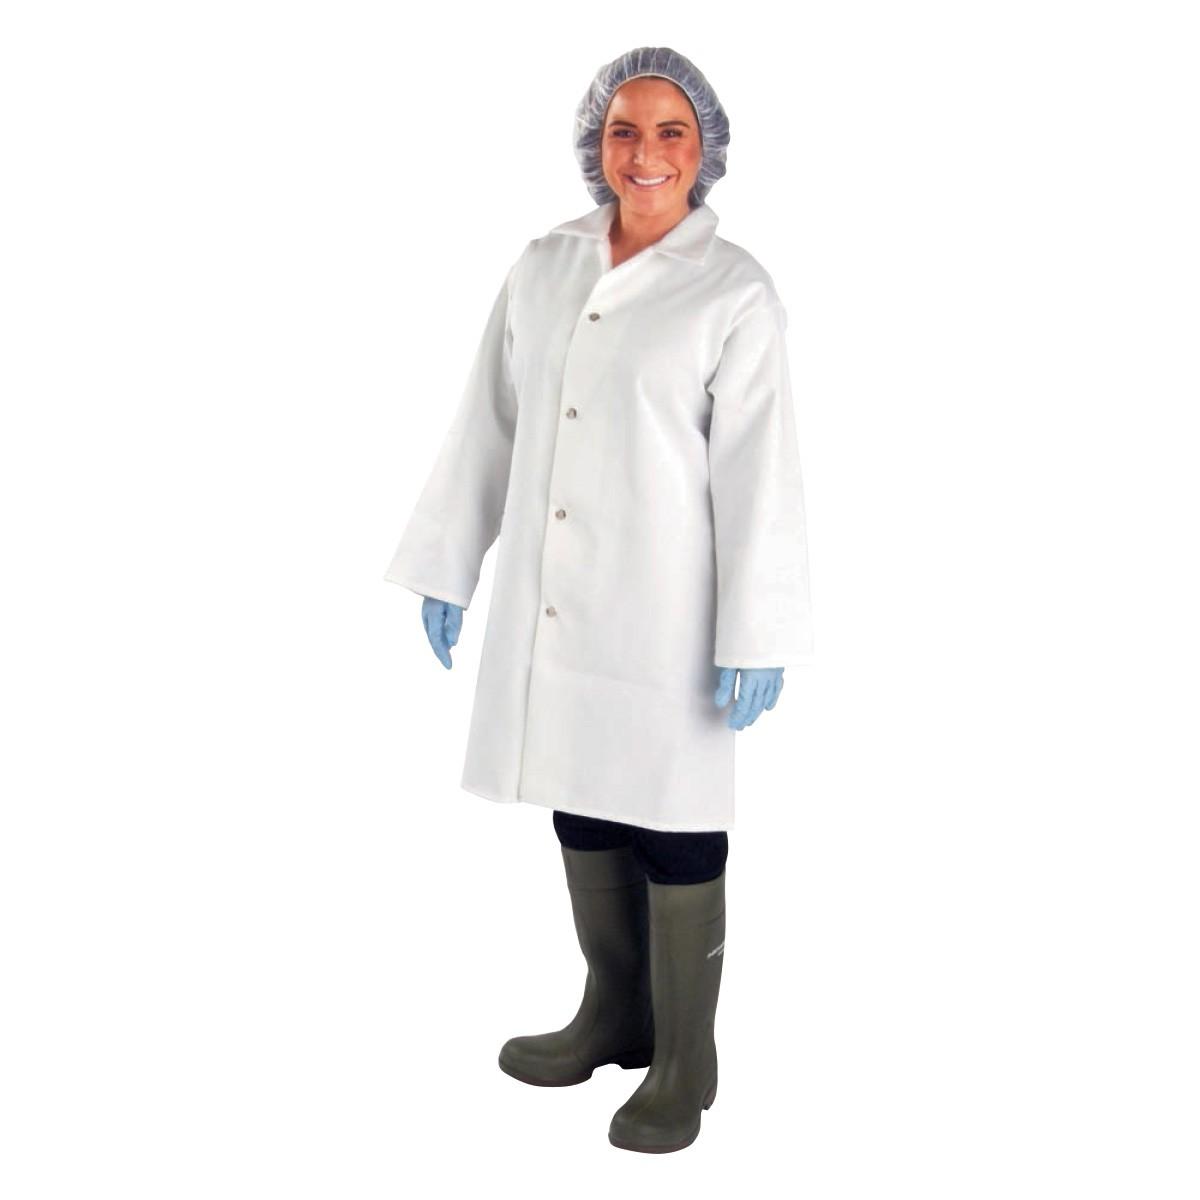 White apron for lab - White Smocks Lab Coats